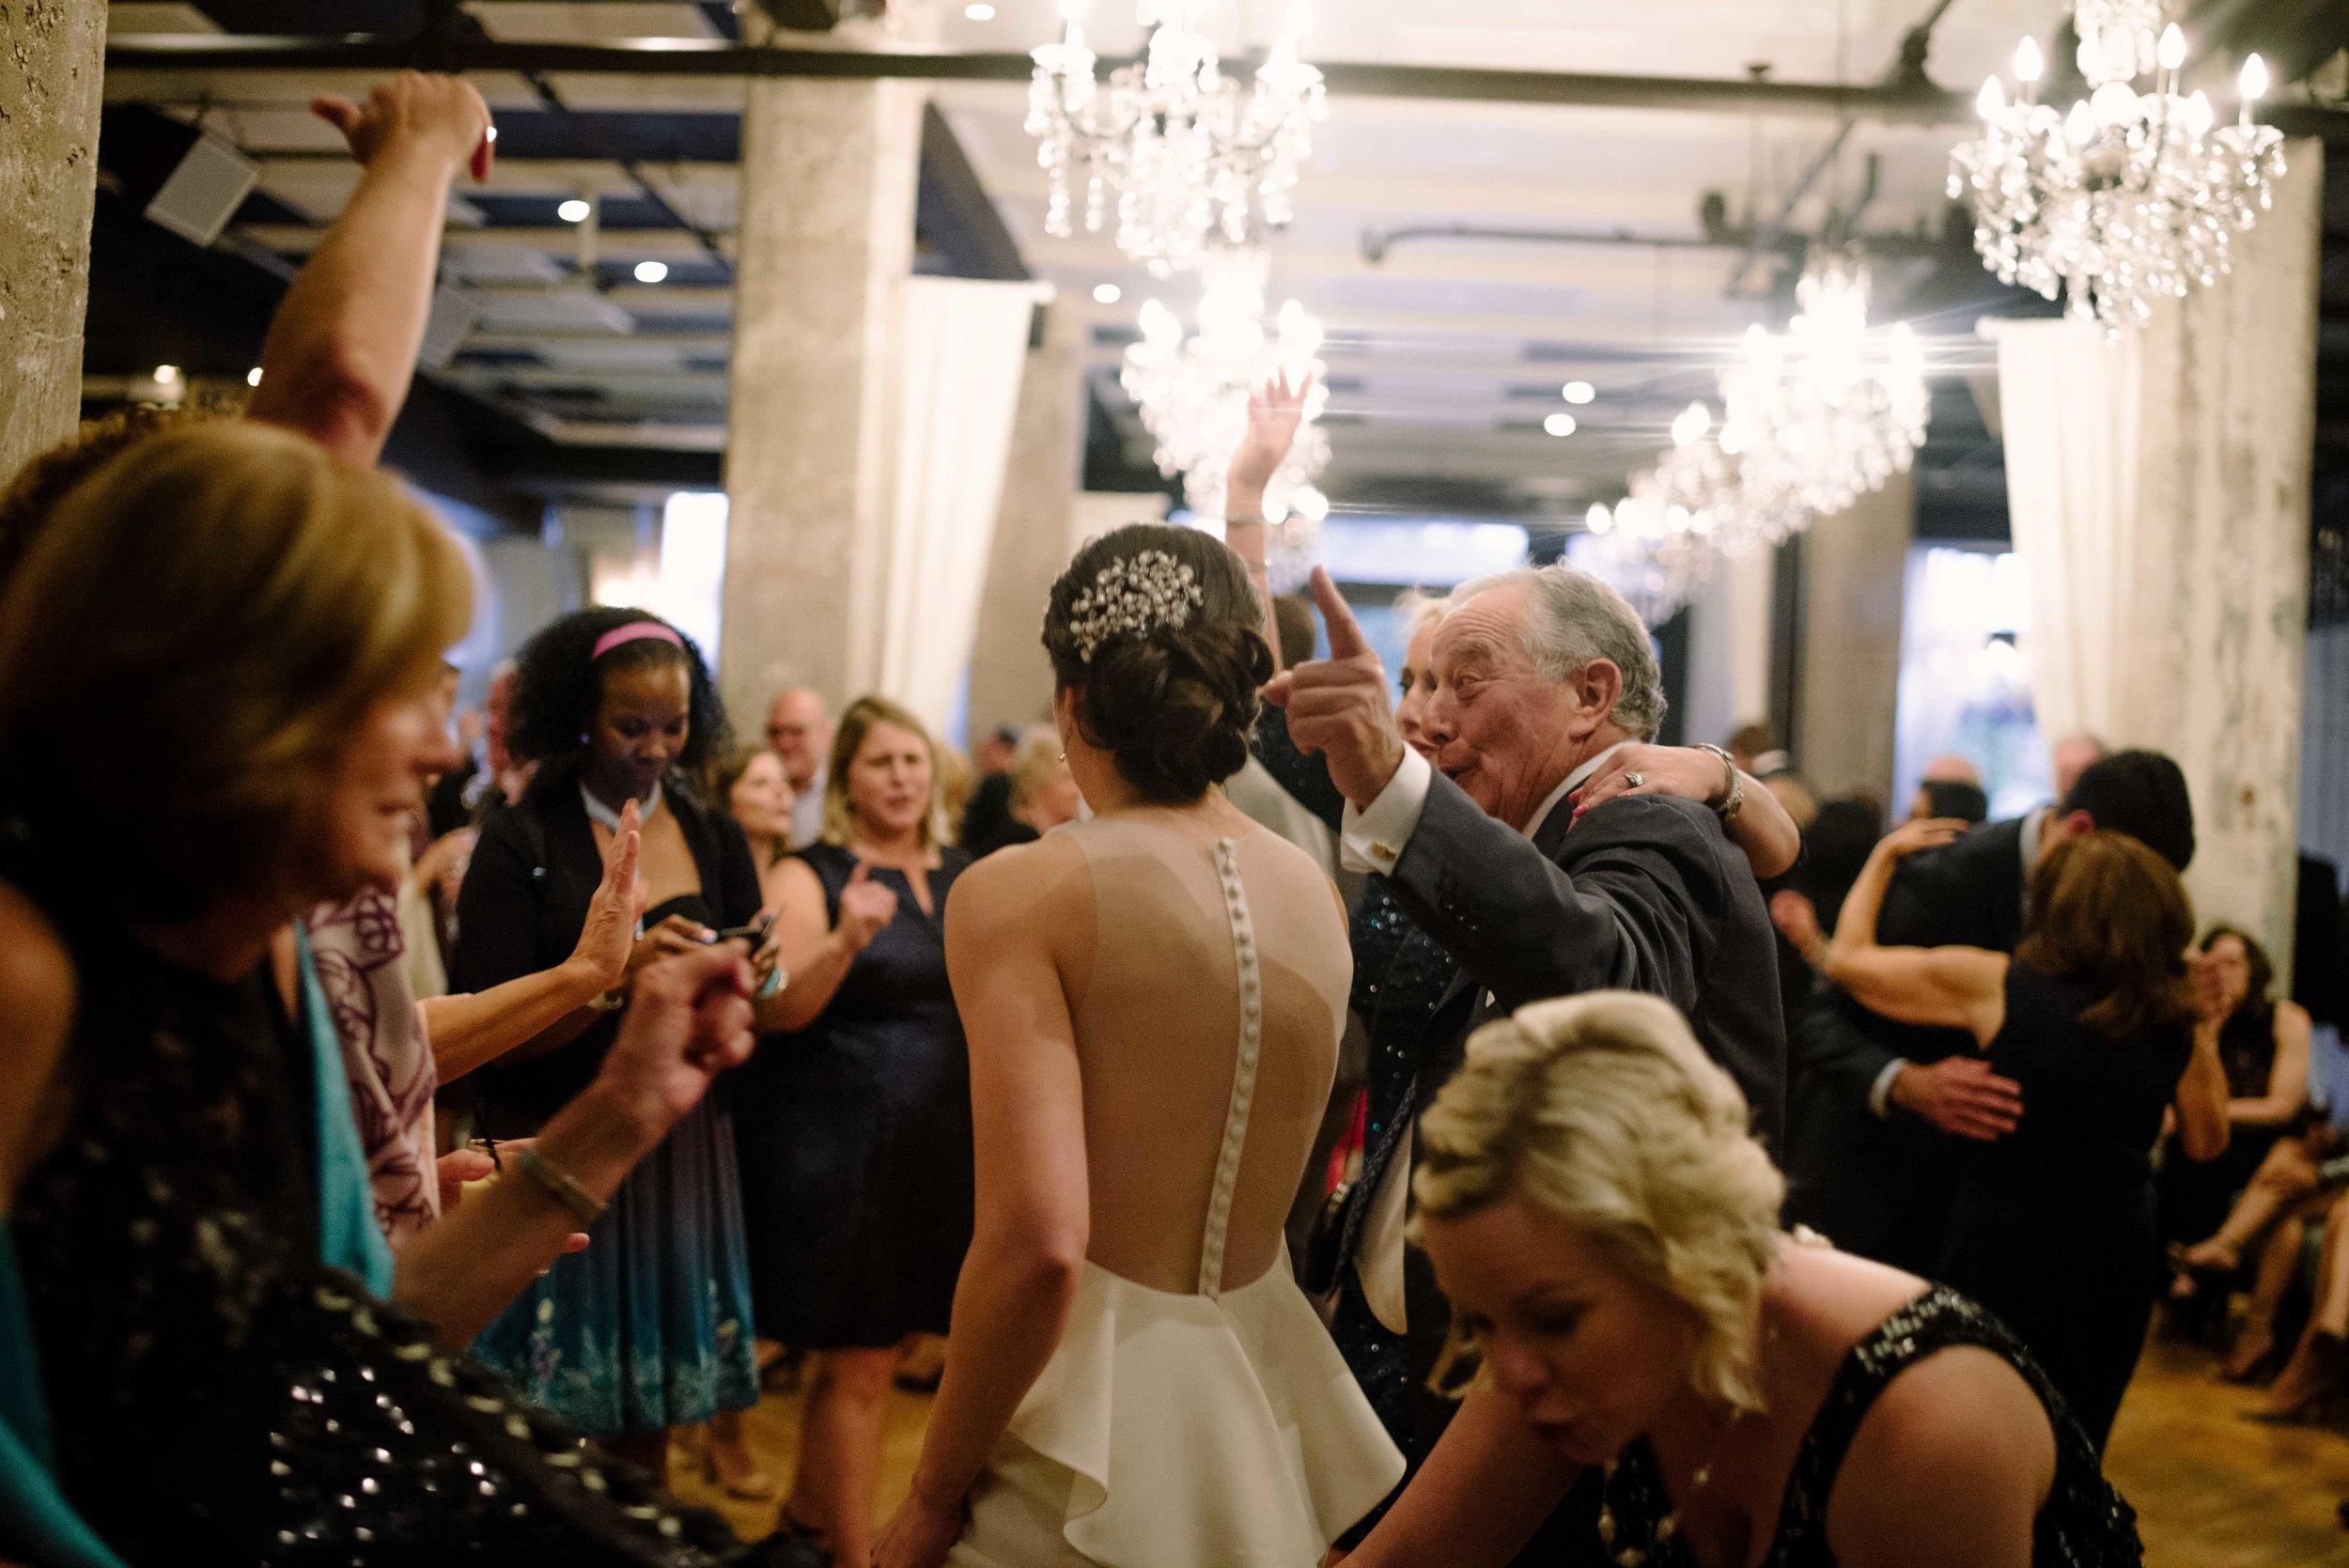 Patricia-Steve-Blog-Indianapolis-Wedding-124.jpg